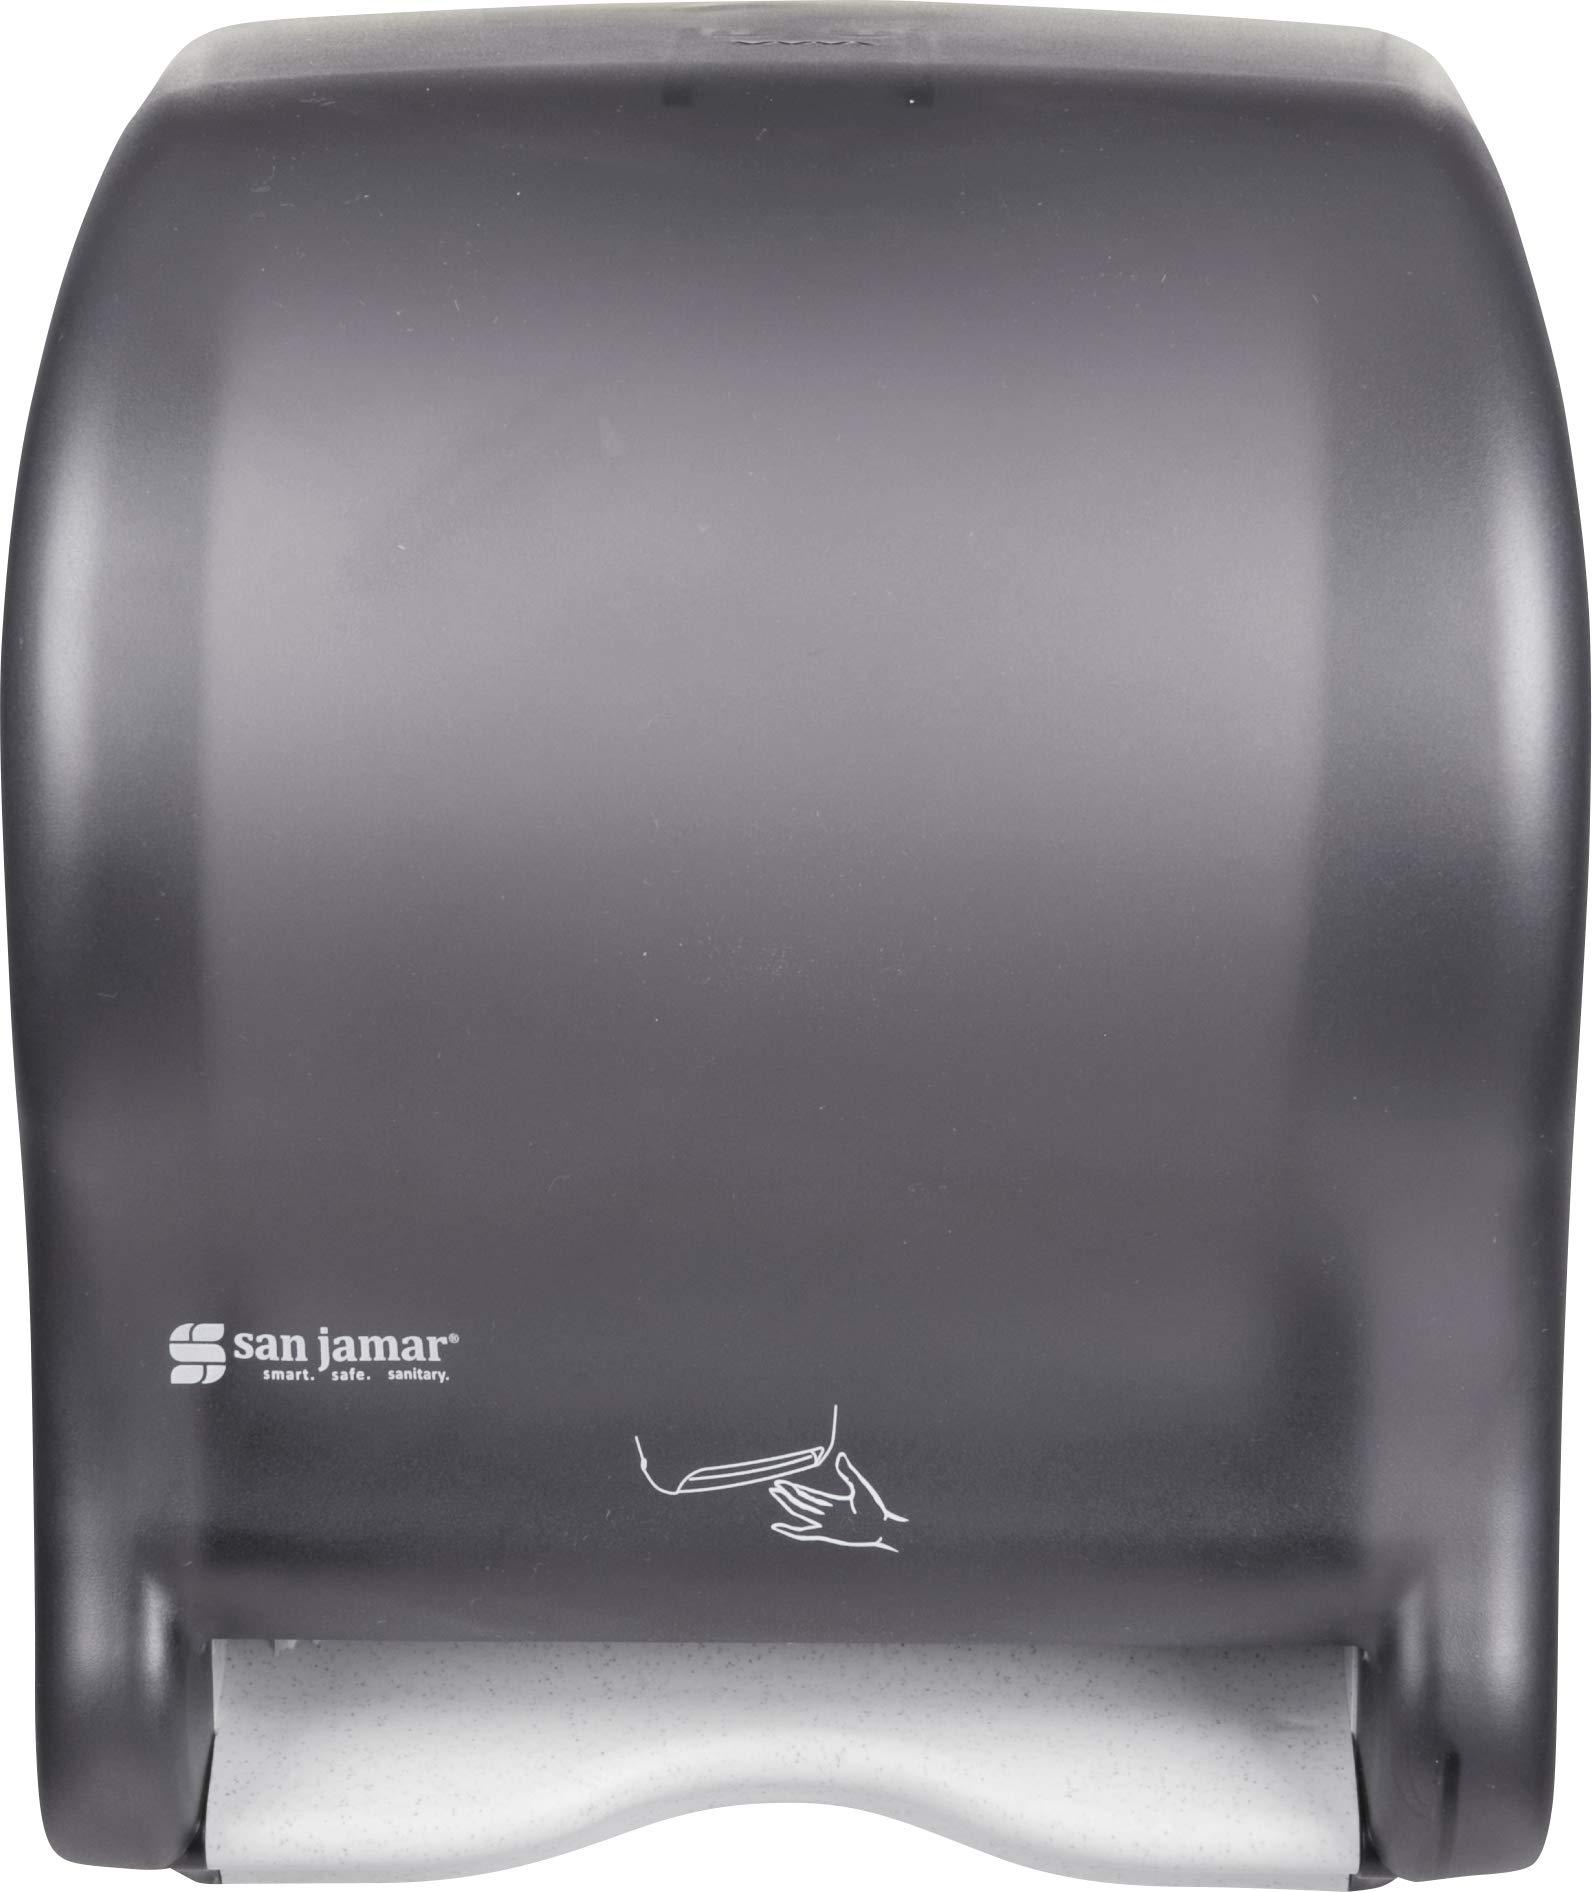 San Jamar T8400TBK Smart Essence Electronic Roll Towel Dispenser, 11.8w x 9.1d x 14.1''h, Black, Plastic by San Jamar (Image #4)